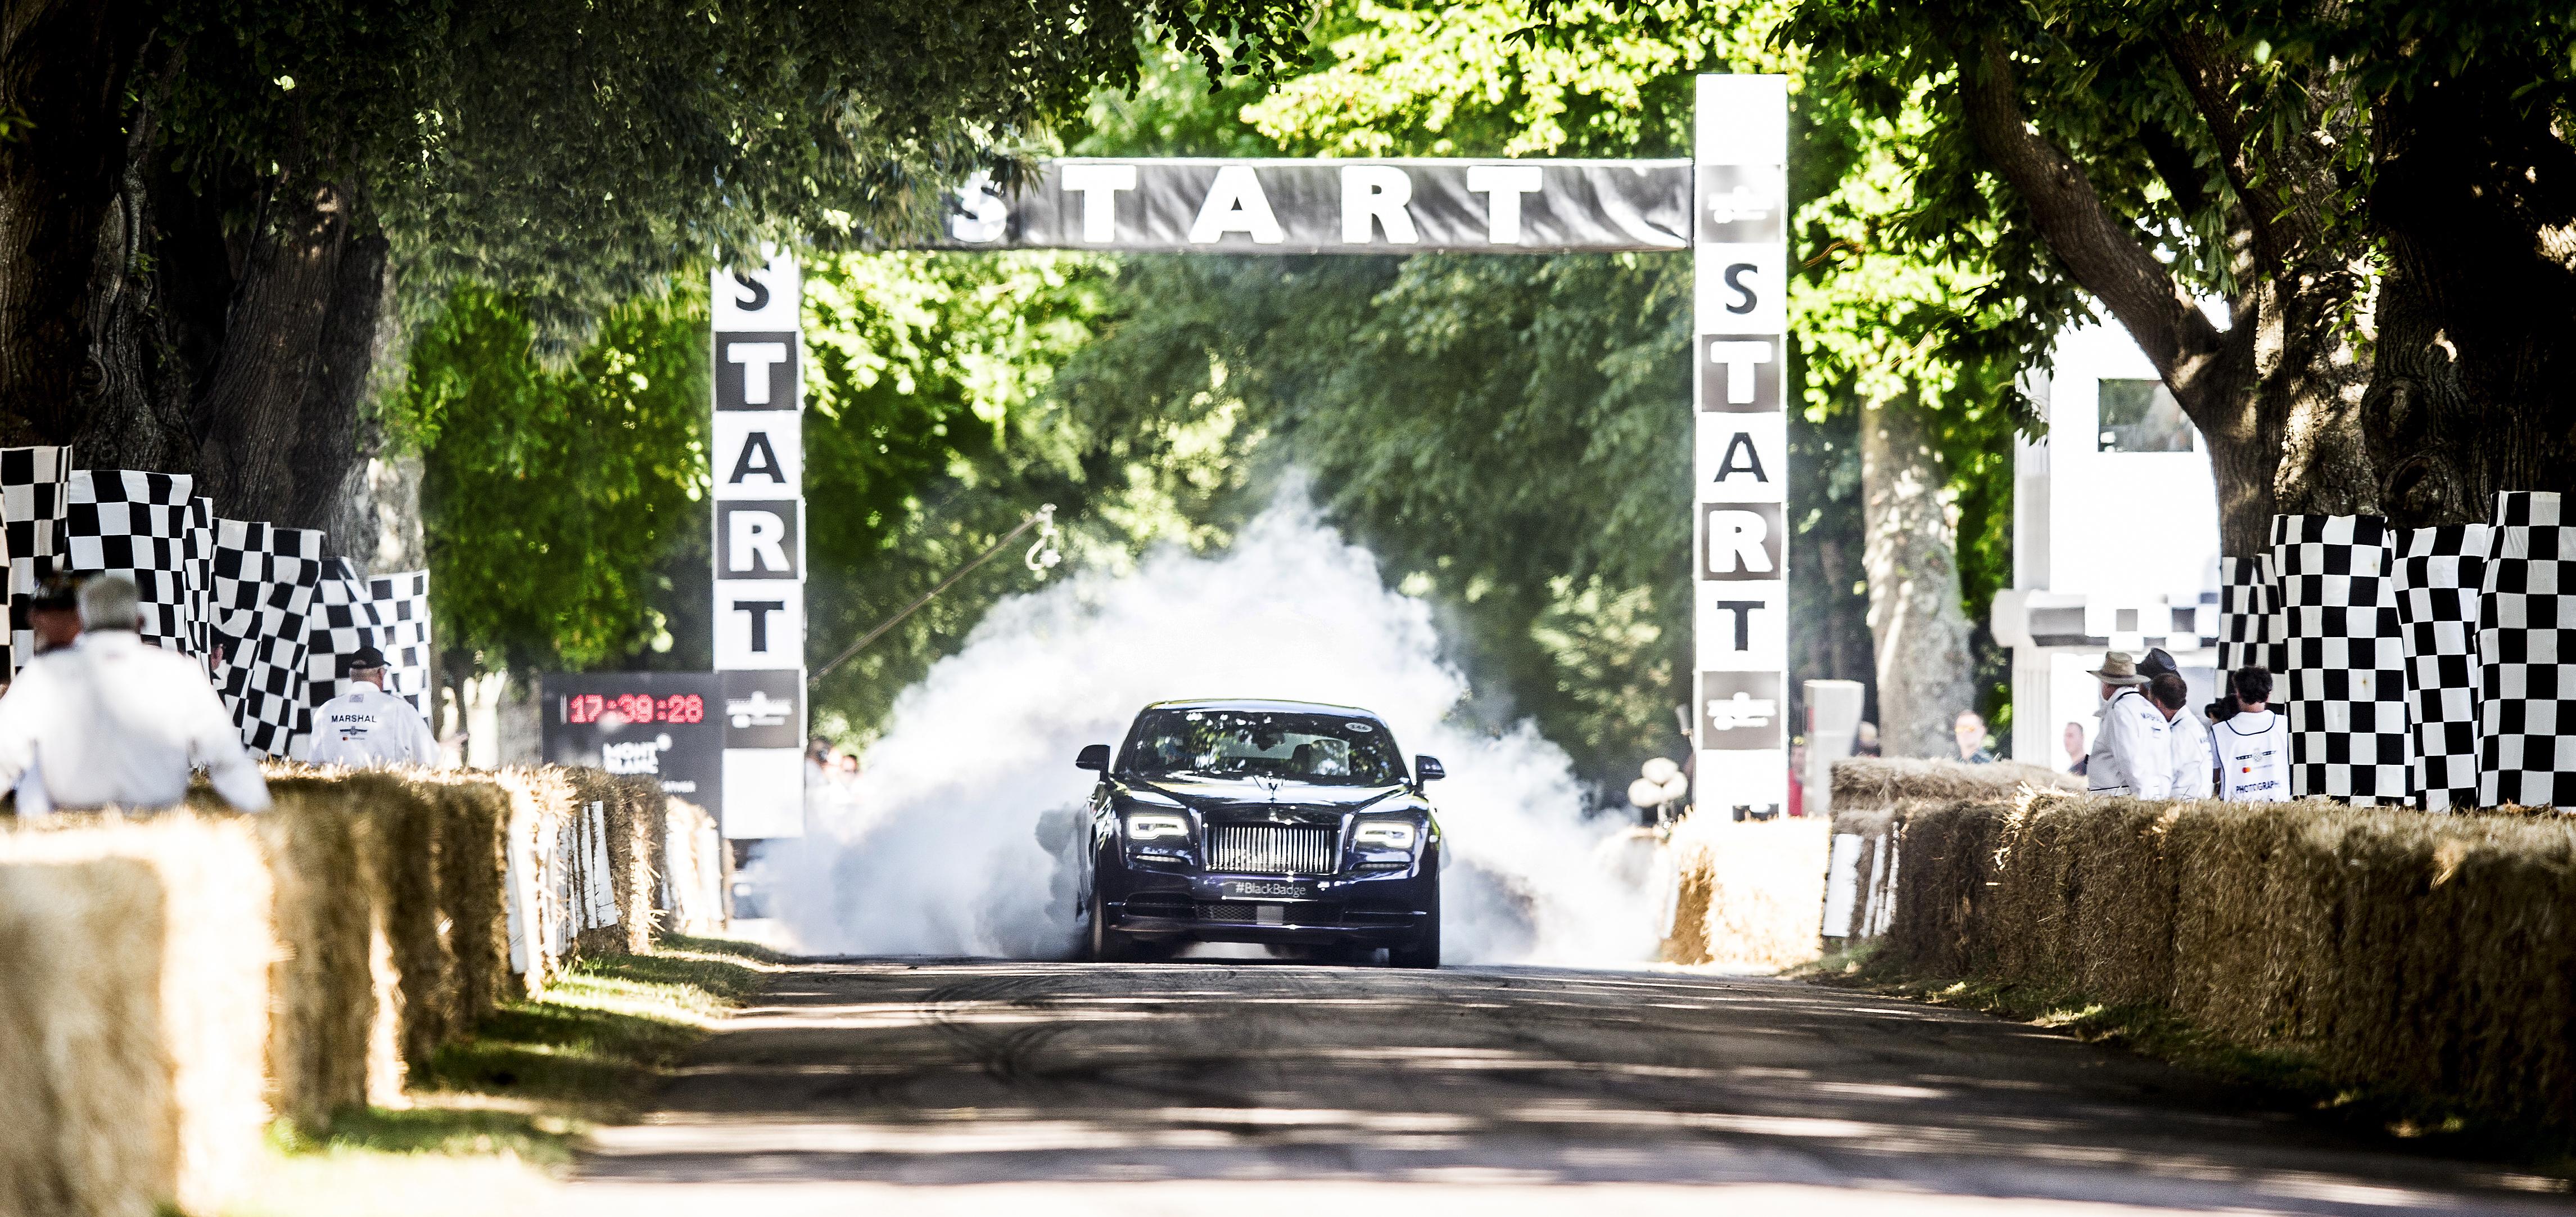 Rolls-Royce Wraith Black Badge. Photo courtesy: Rolls-Royce